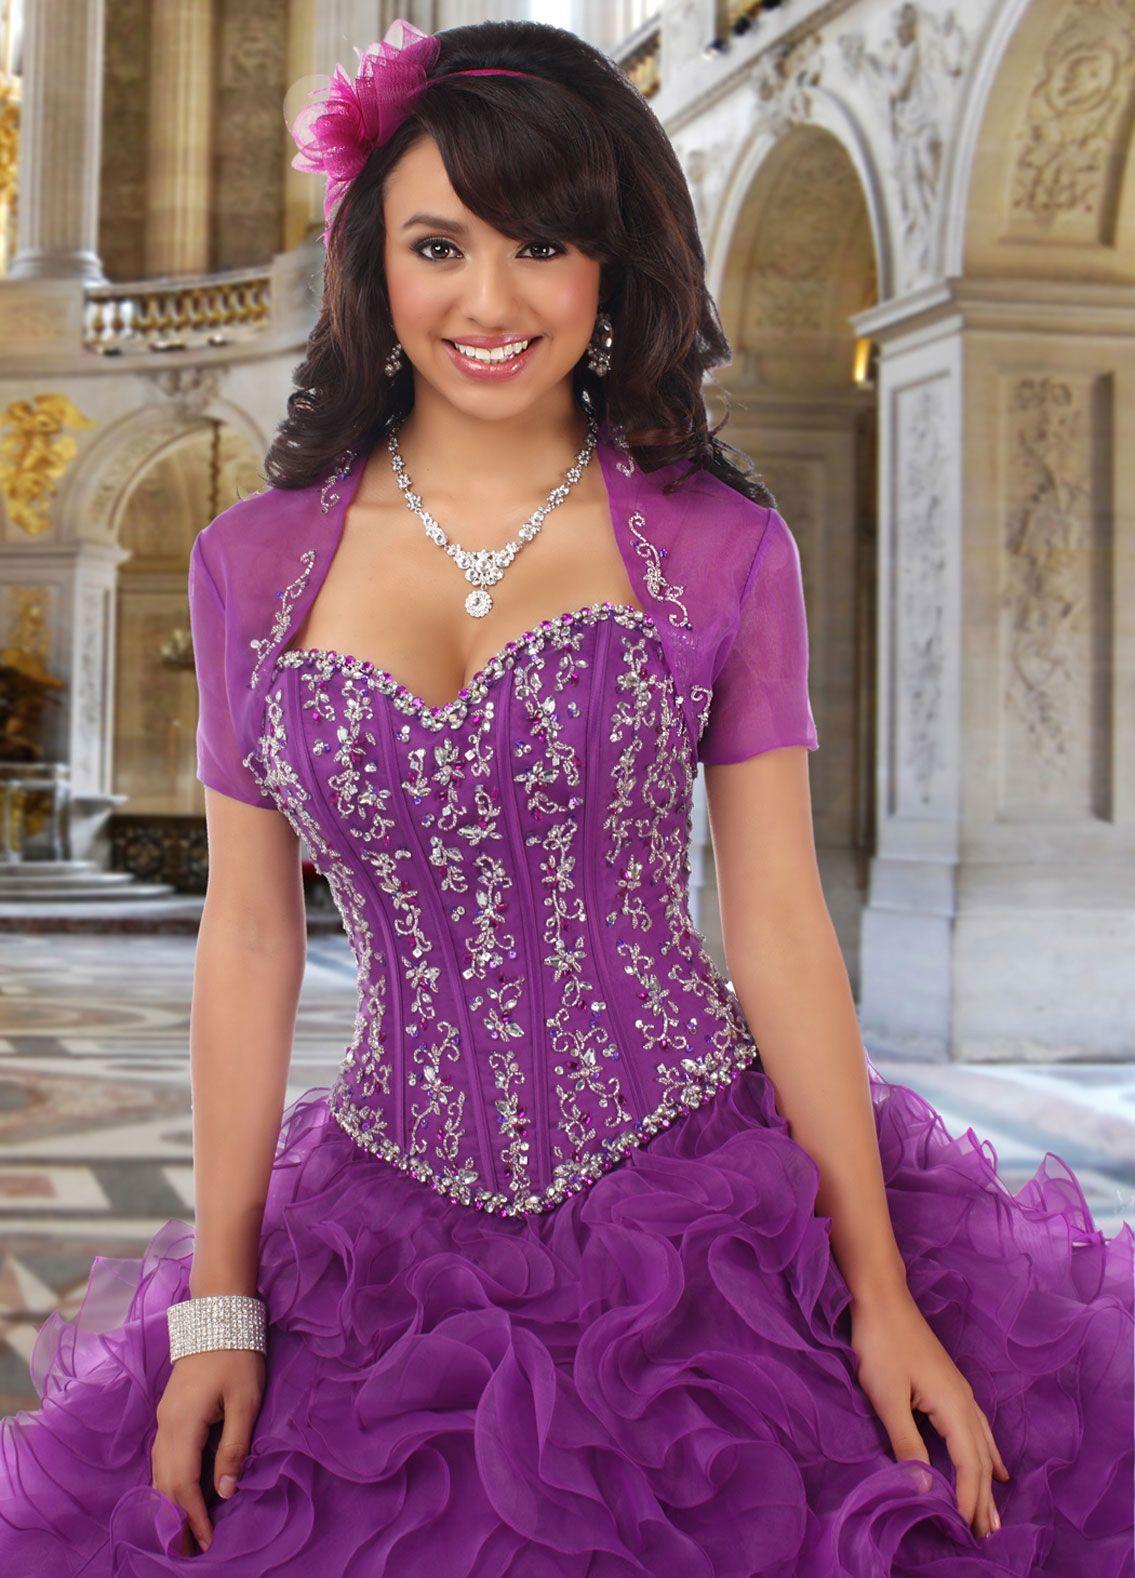 Pin de Priya Avi Sasi en Ball Gowns | Pinterest